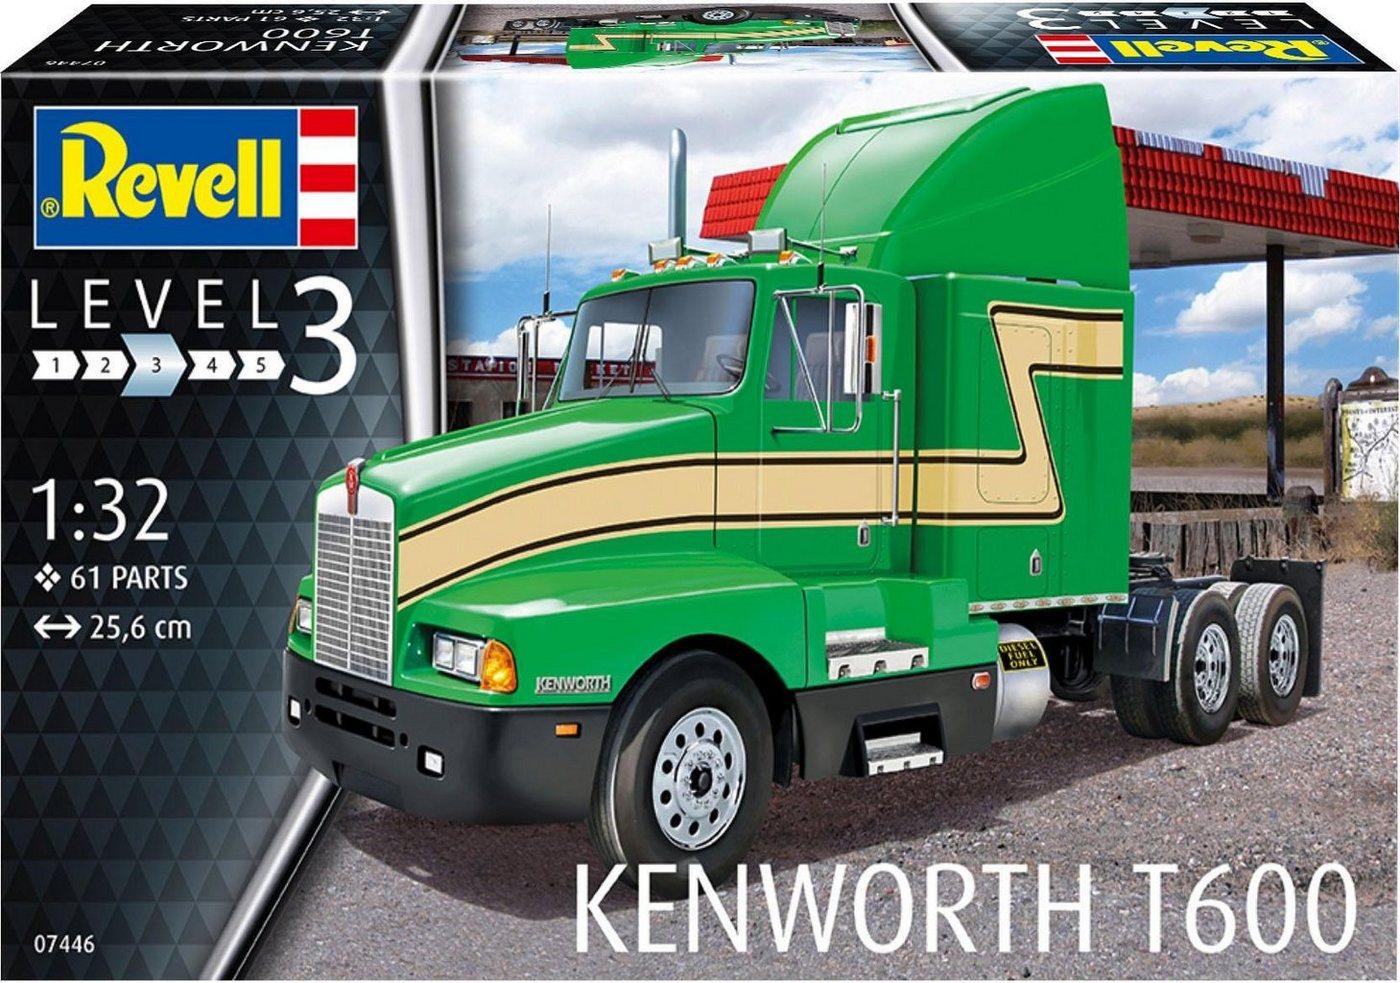 Revell Modellbausatz LKW, Maßstab 1:32, »Kenworth T600«